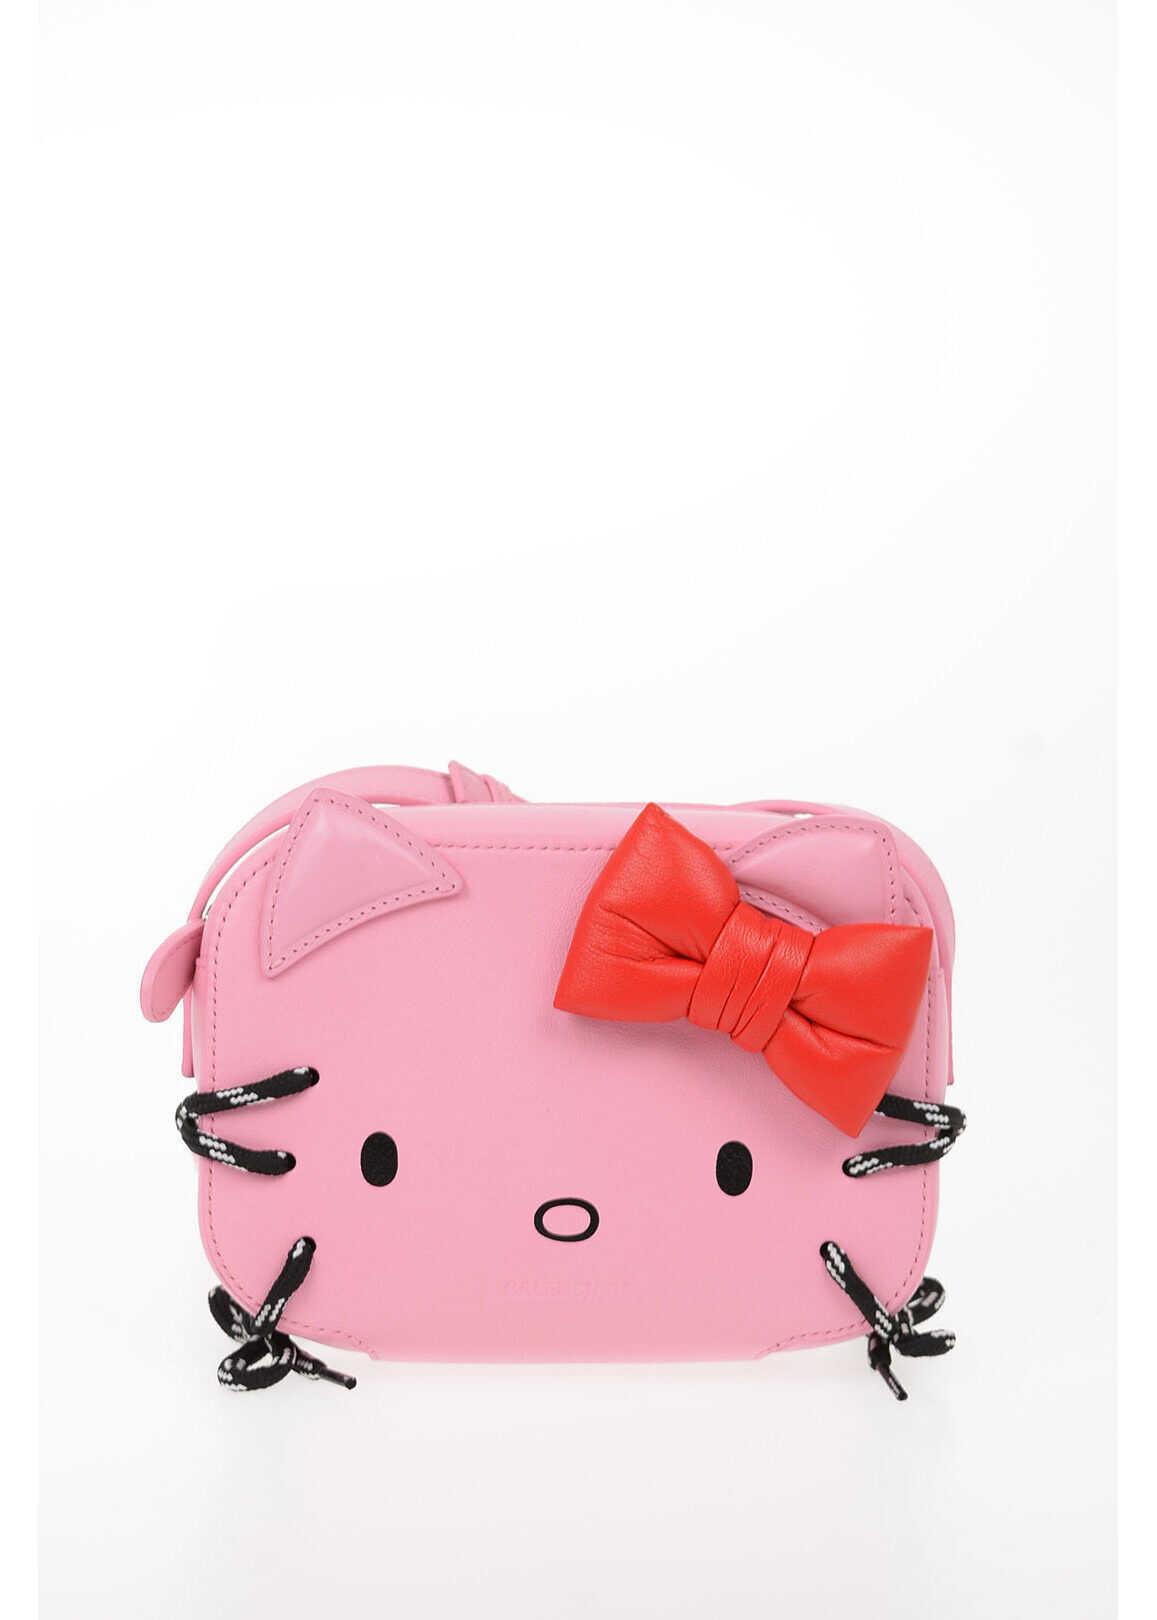 Balenciaga Leather HELLO KITTY Mini Crossbody Bag PINK imagine b-mall.ro